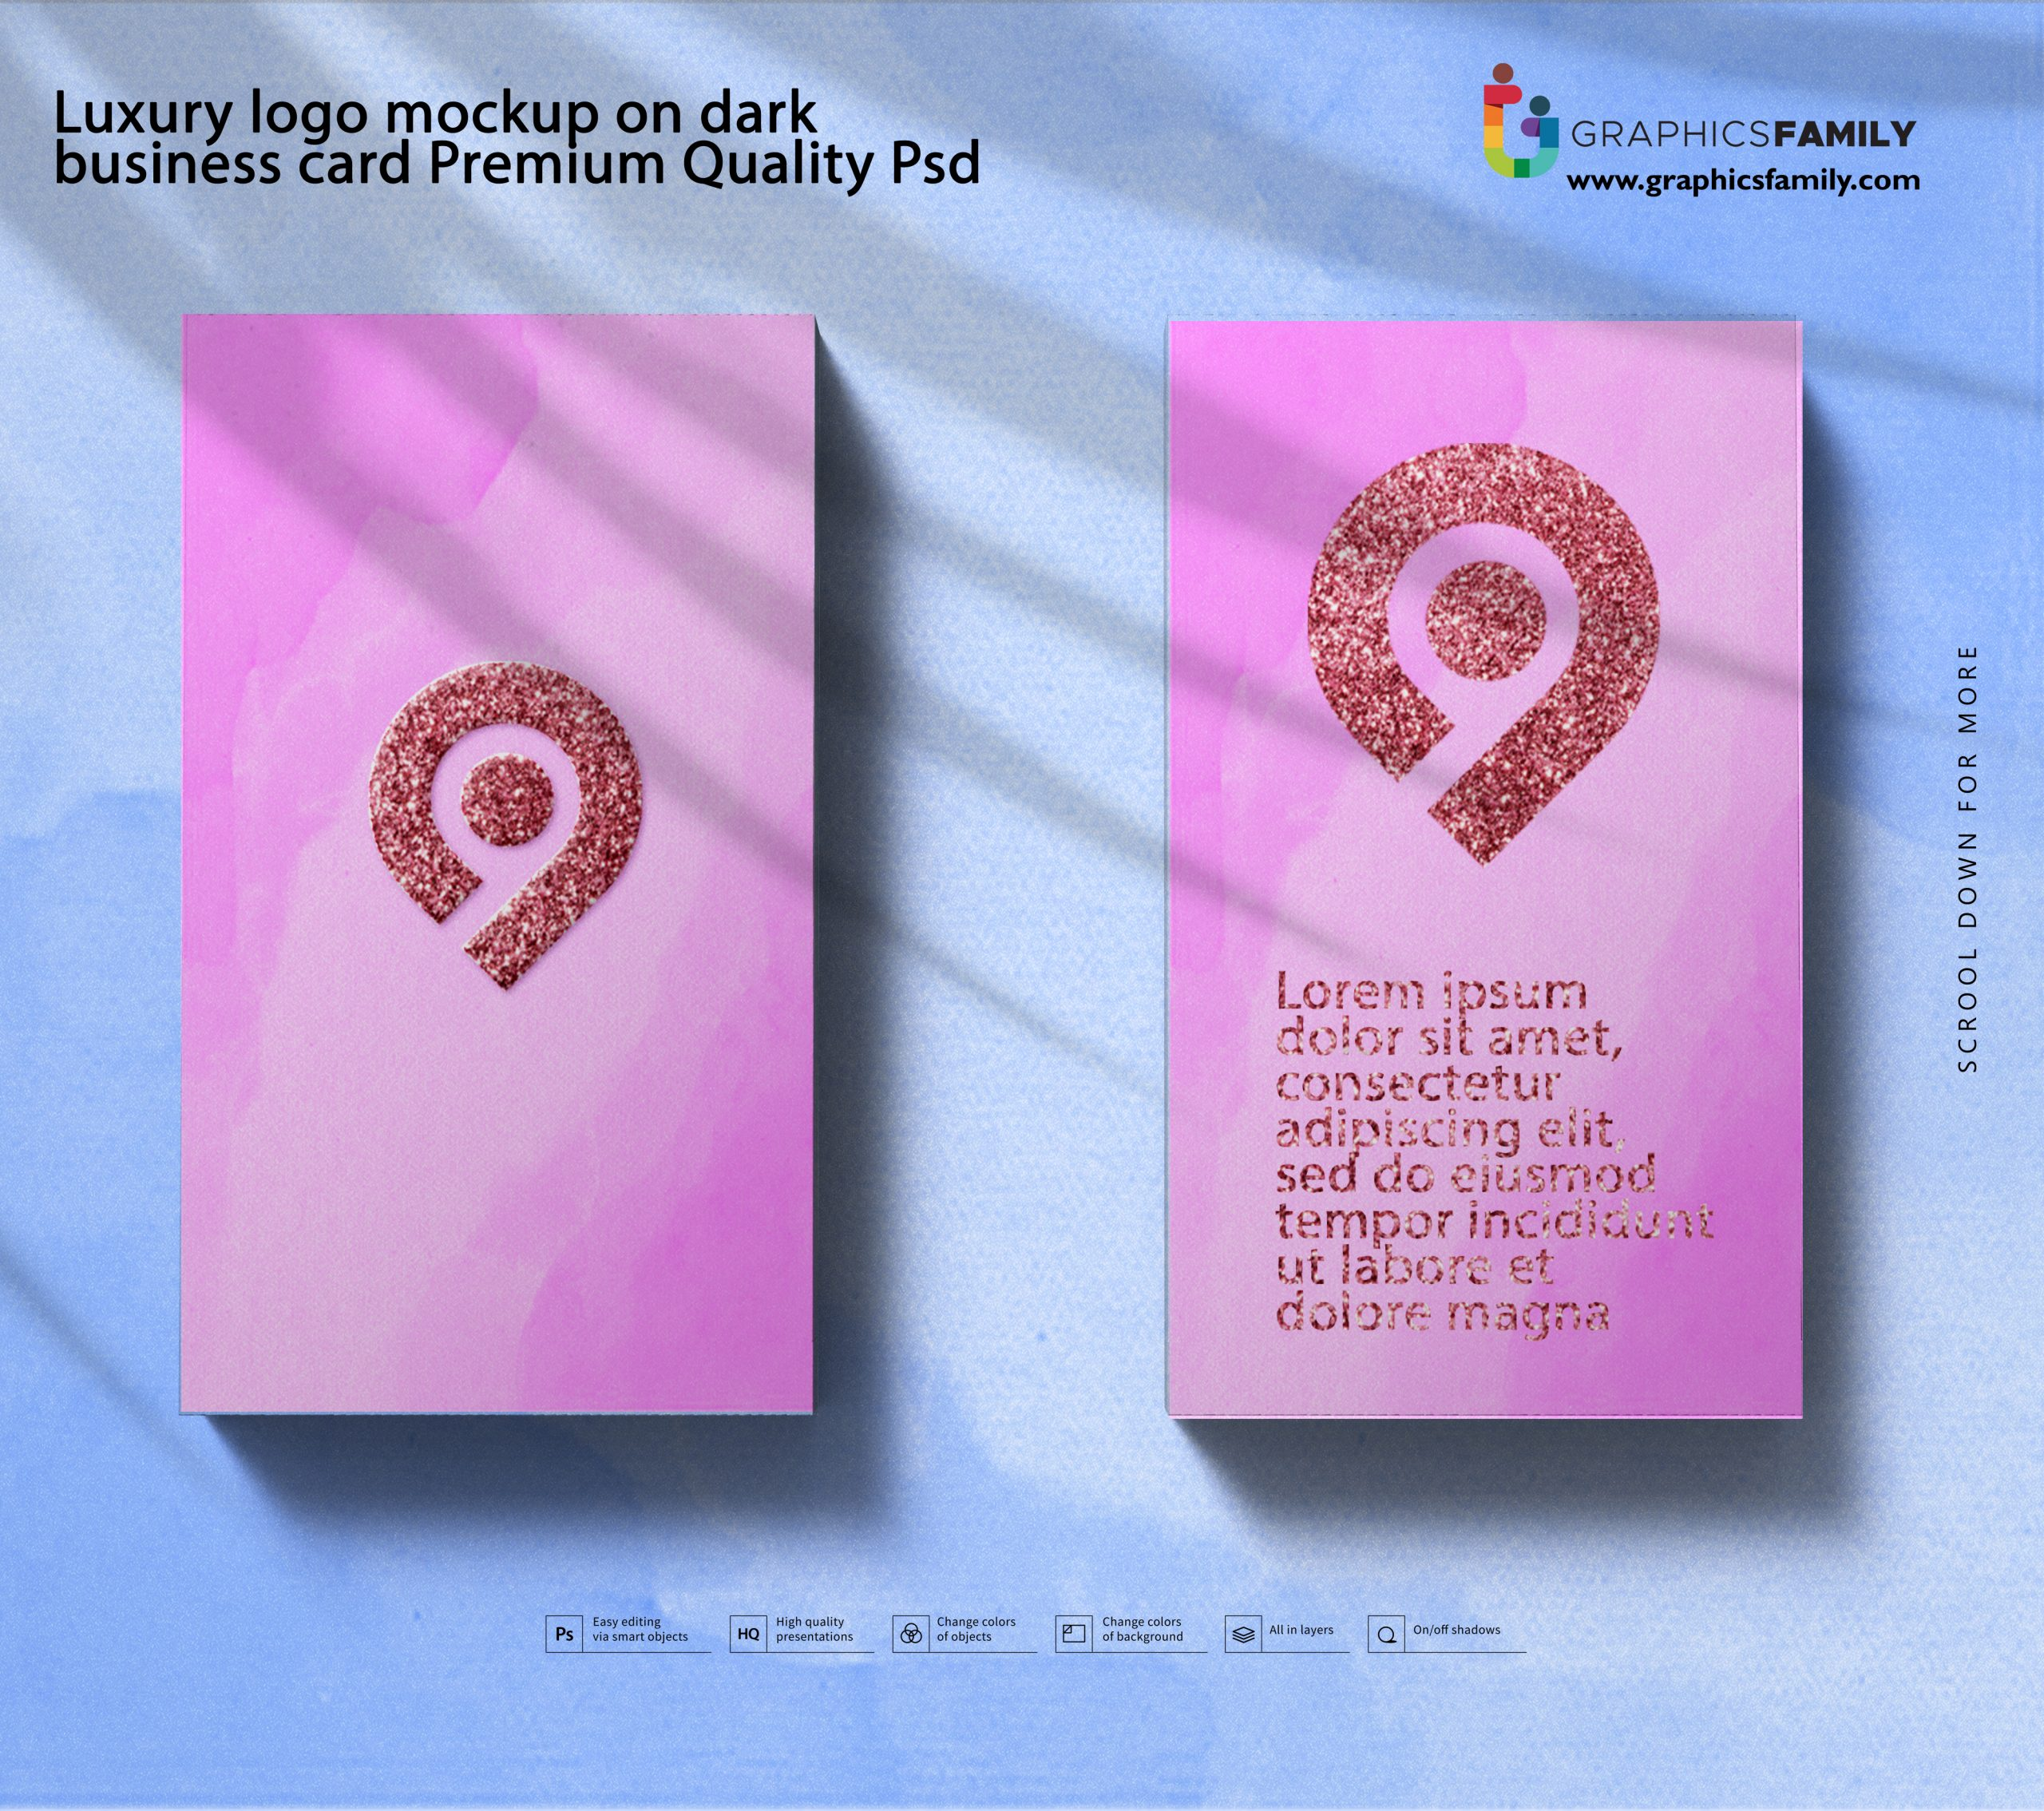 Luxury logo mockup on dark business card Premium Quality Psd Download